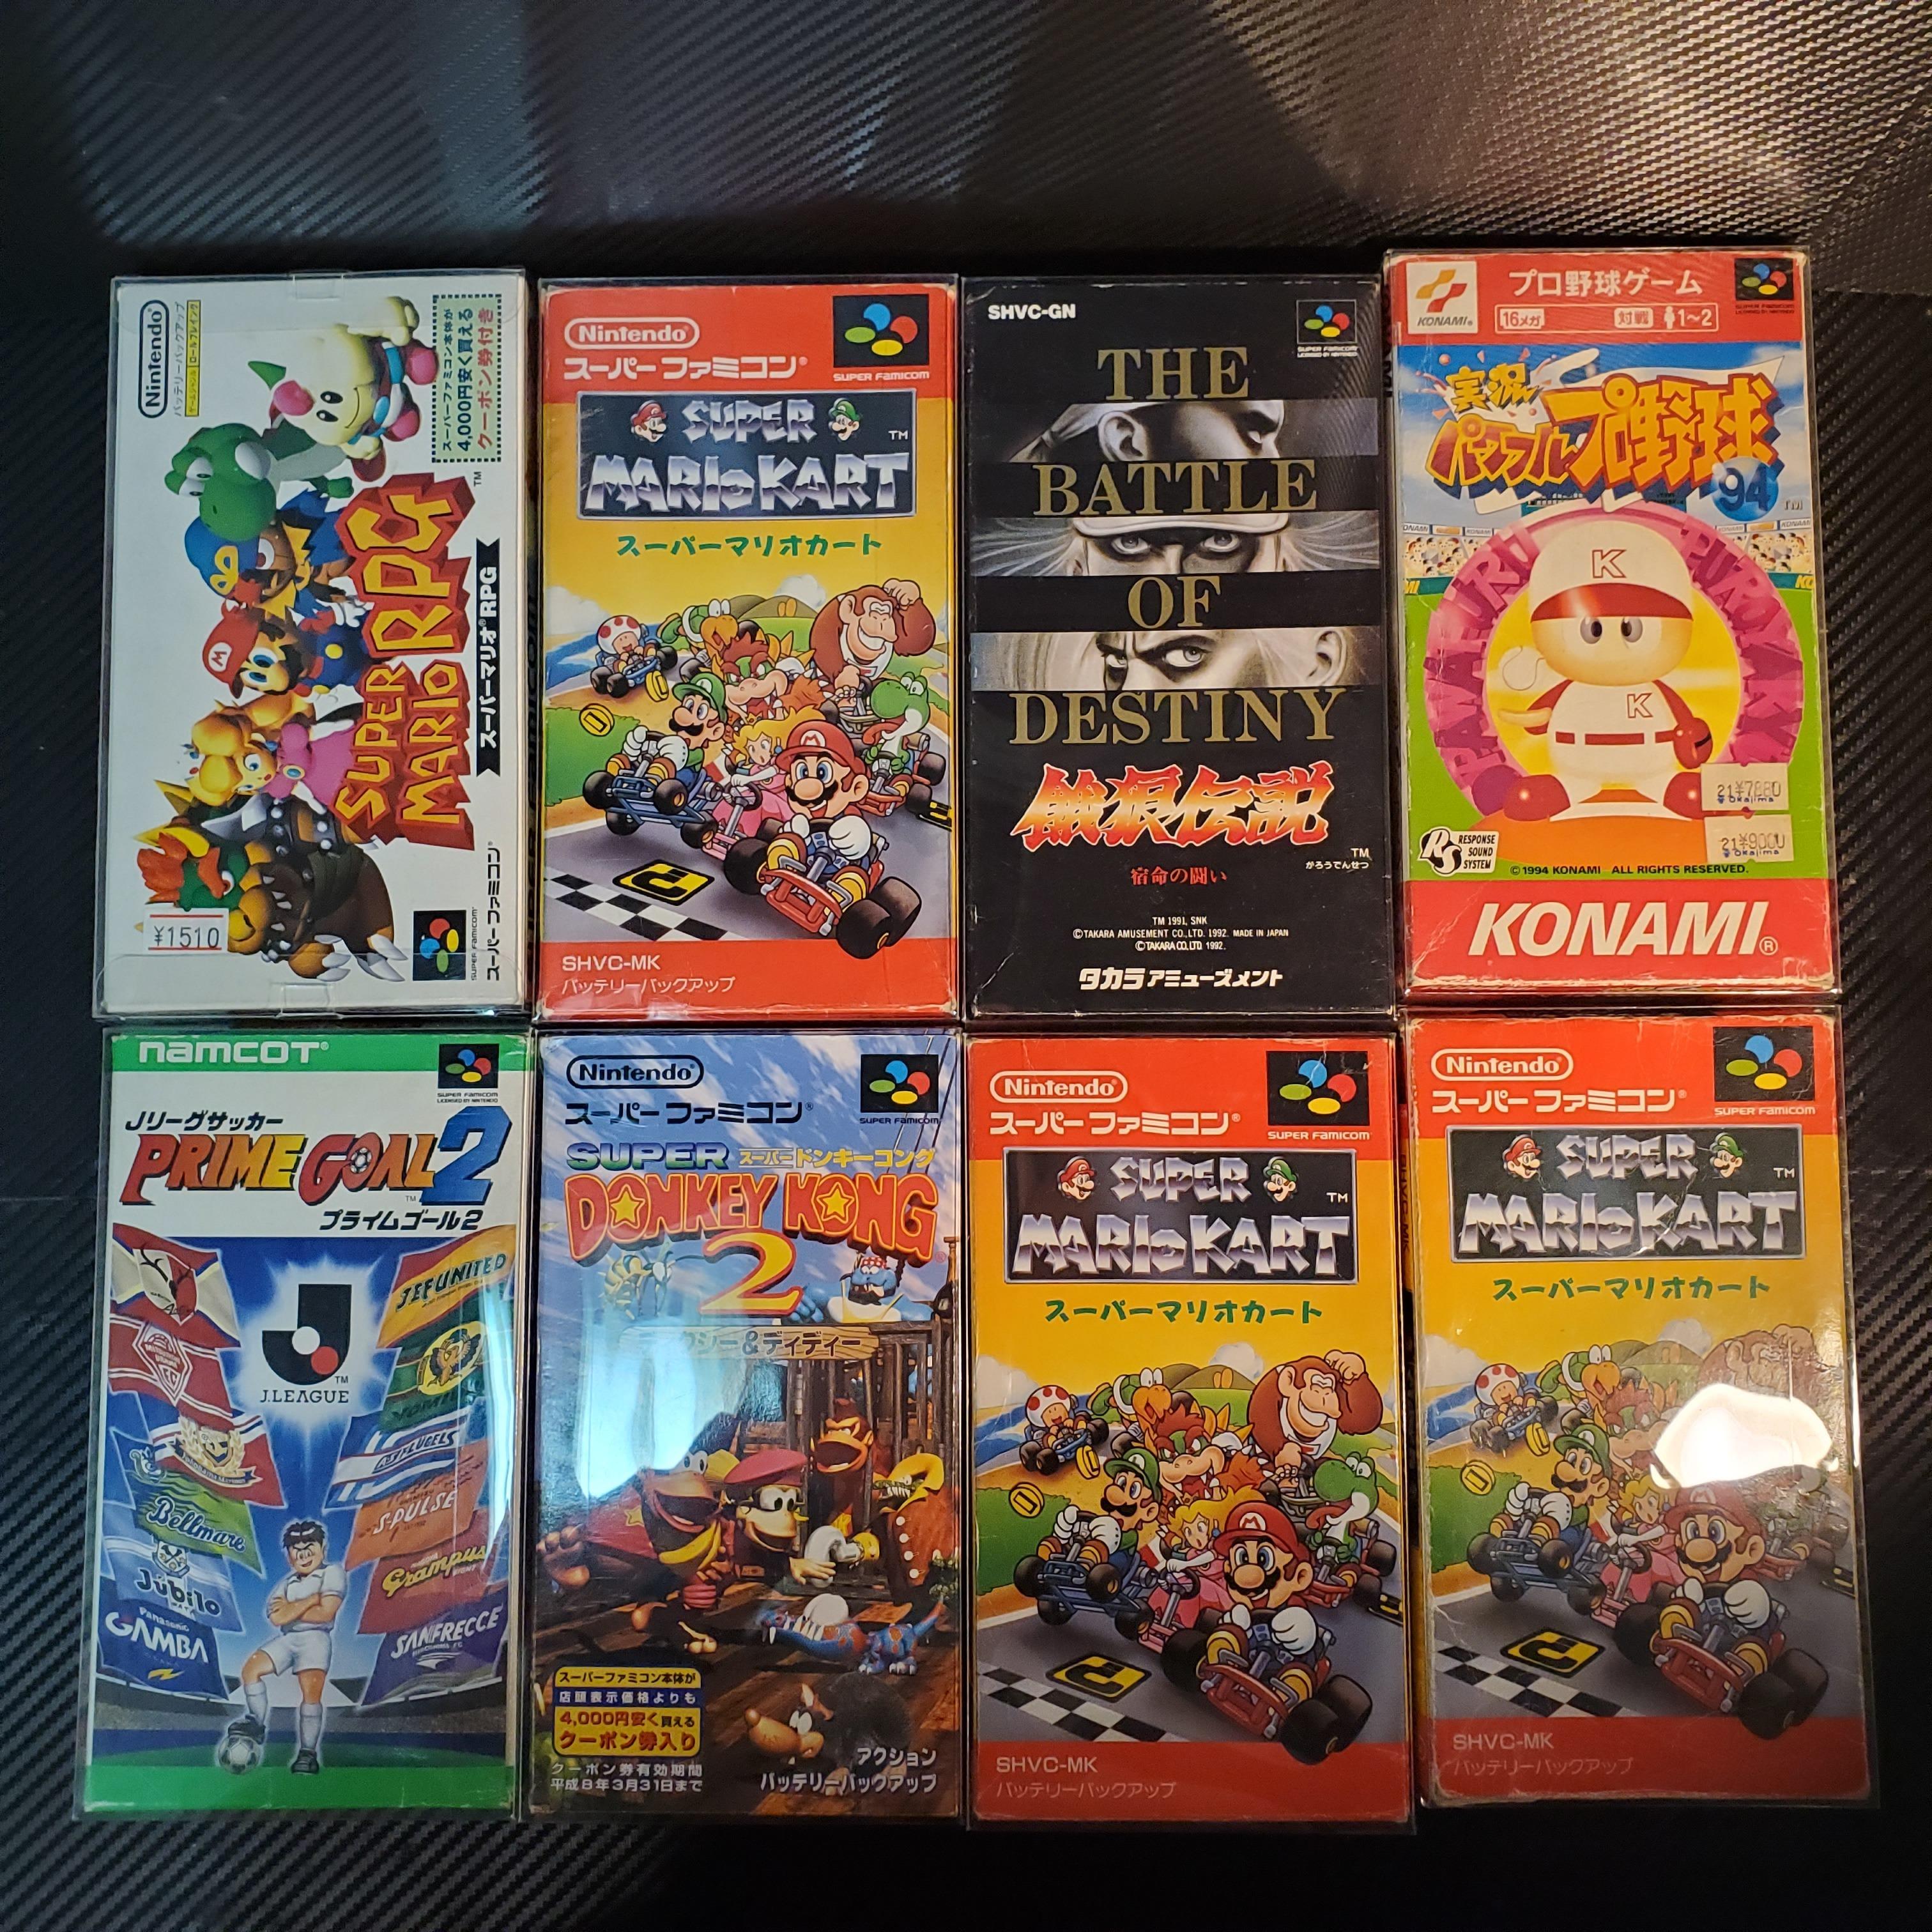 [VDS] Nostalgeek Store — Super Famicom / GBA / GB / Nintendo 64 / GameCube 201005104654727118